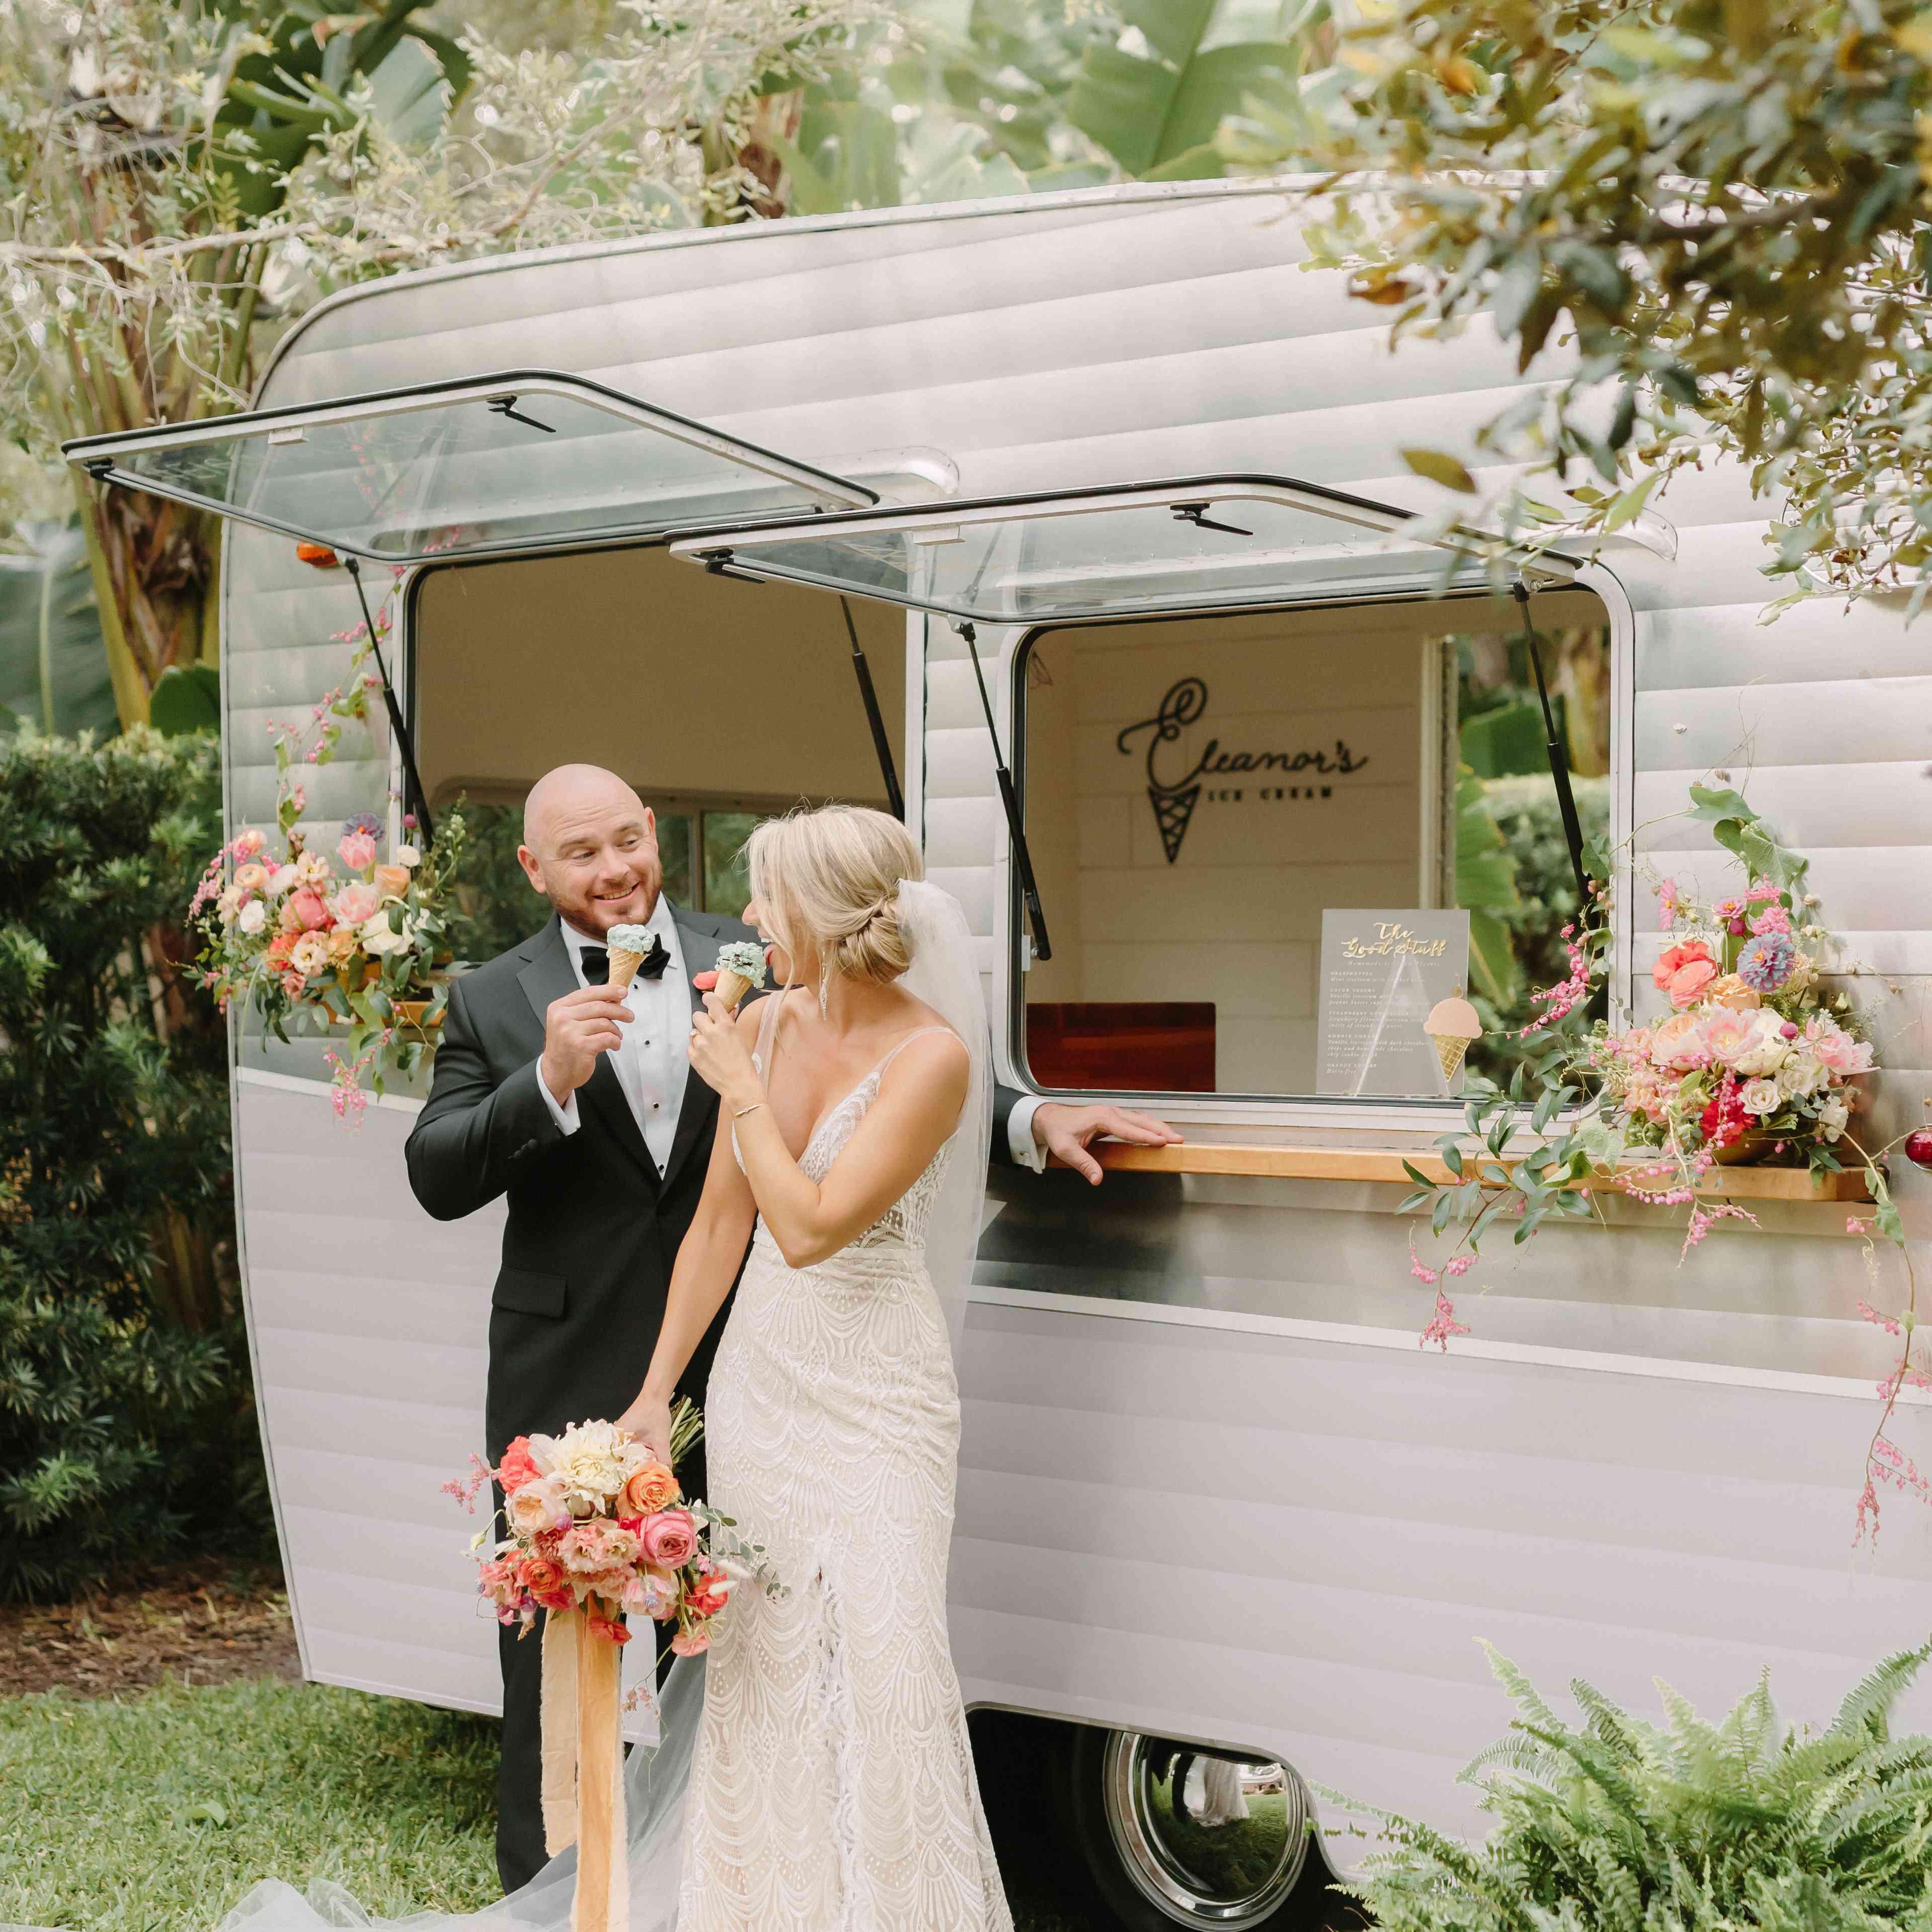 Wedding ice cream caravan